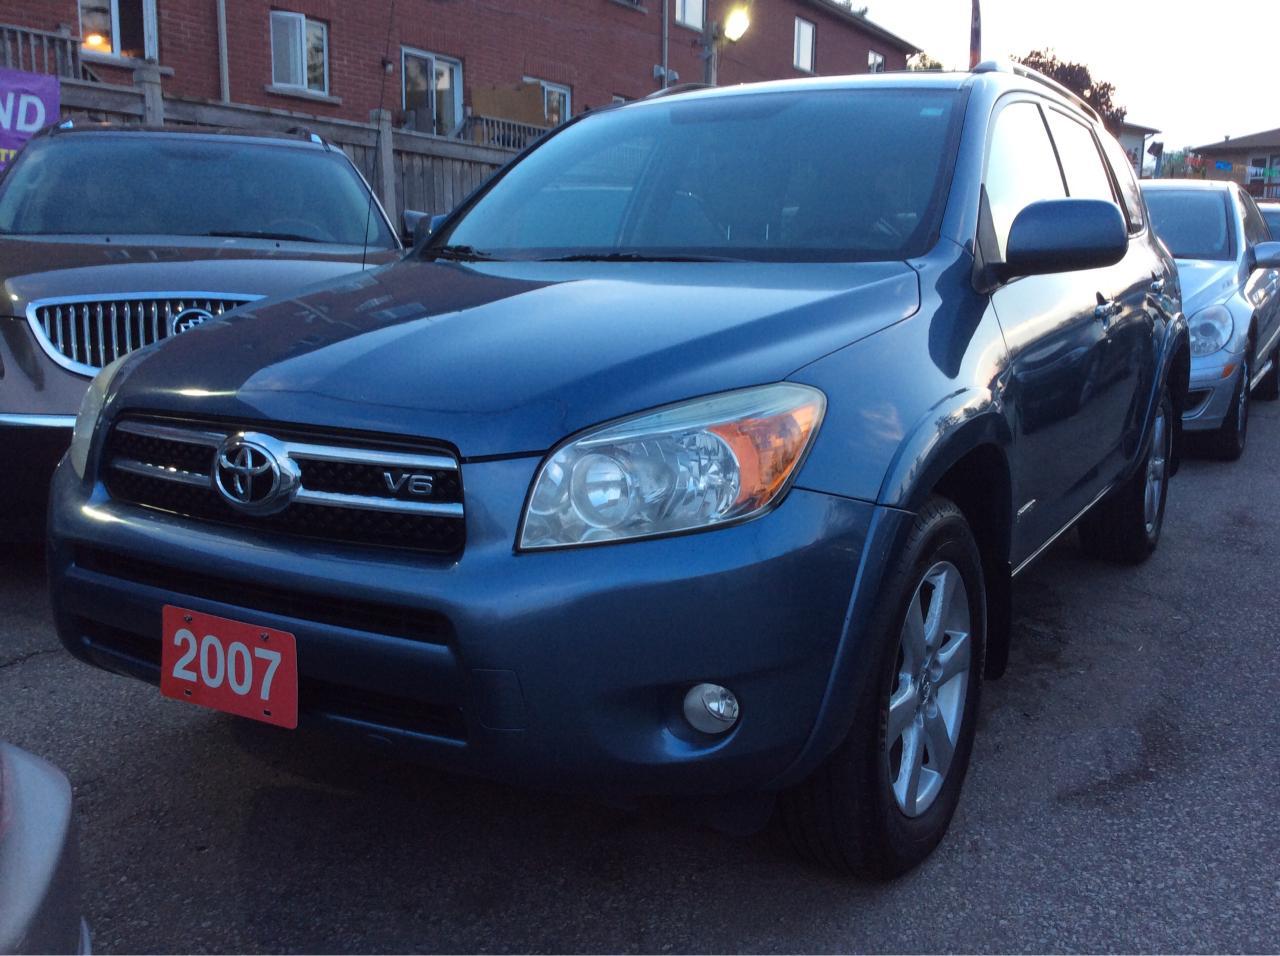 2007 Toyota RAV4 Limited/Blue Tooth/Heated Seats/Power Seat Sun Roo